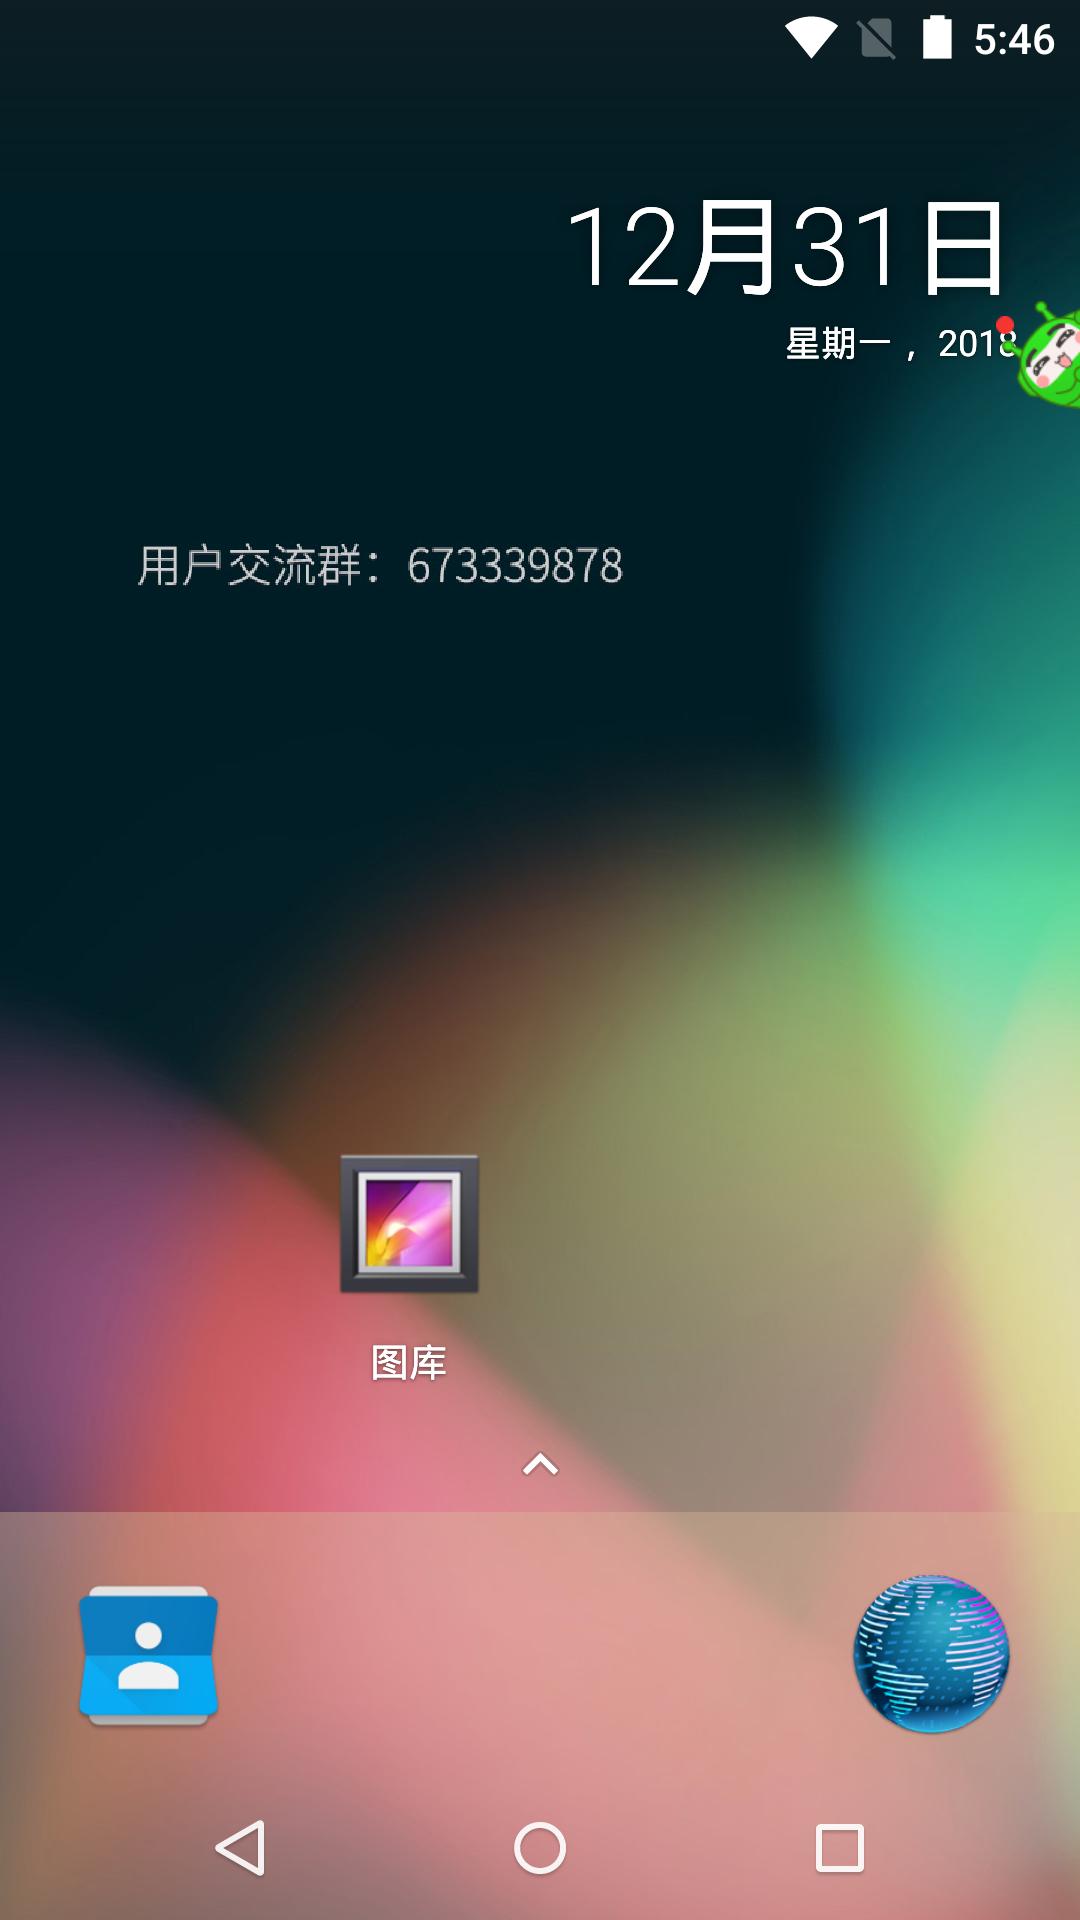 Screenshot_2018-12-31-17-46-52.png